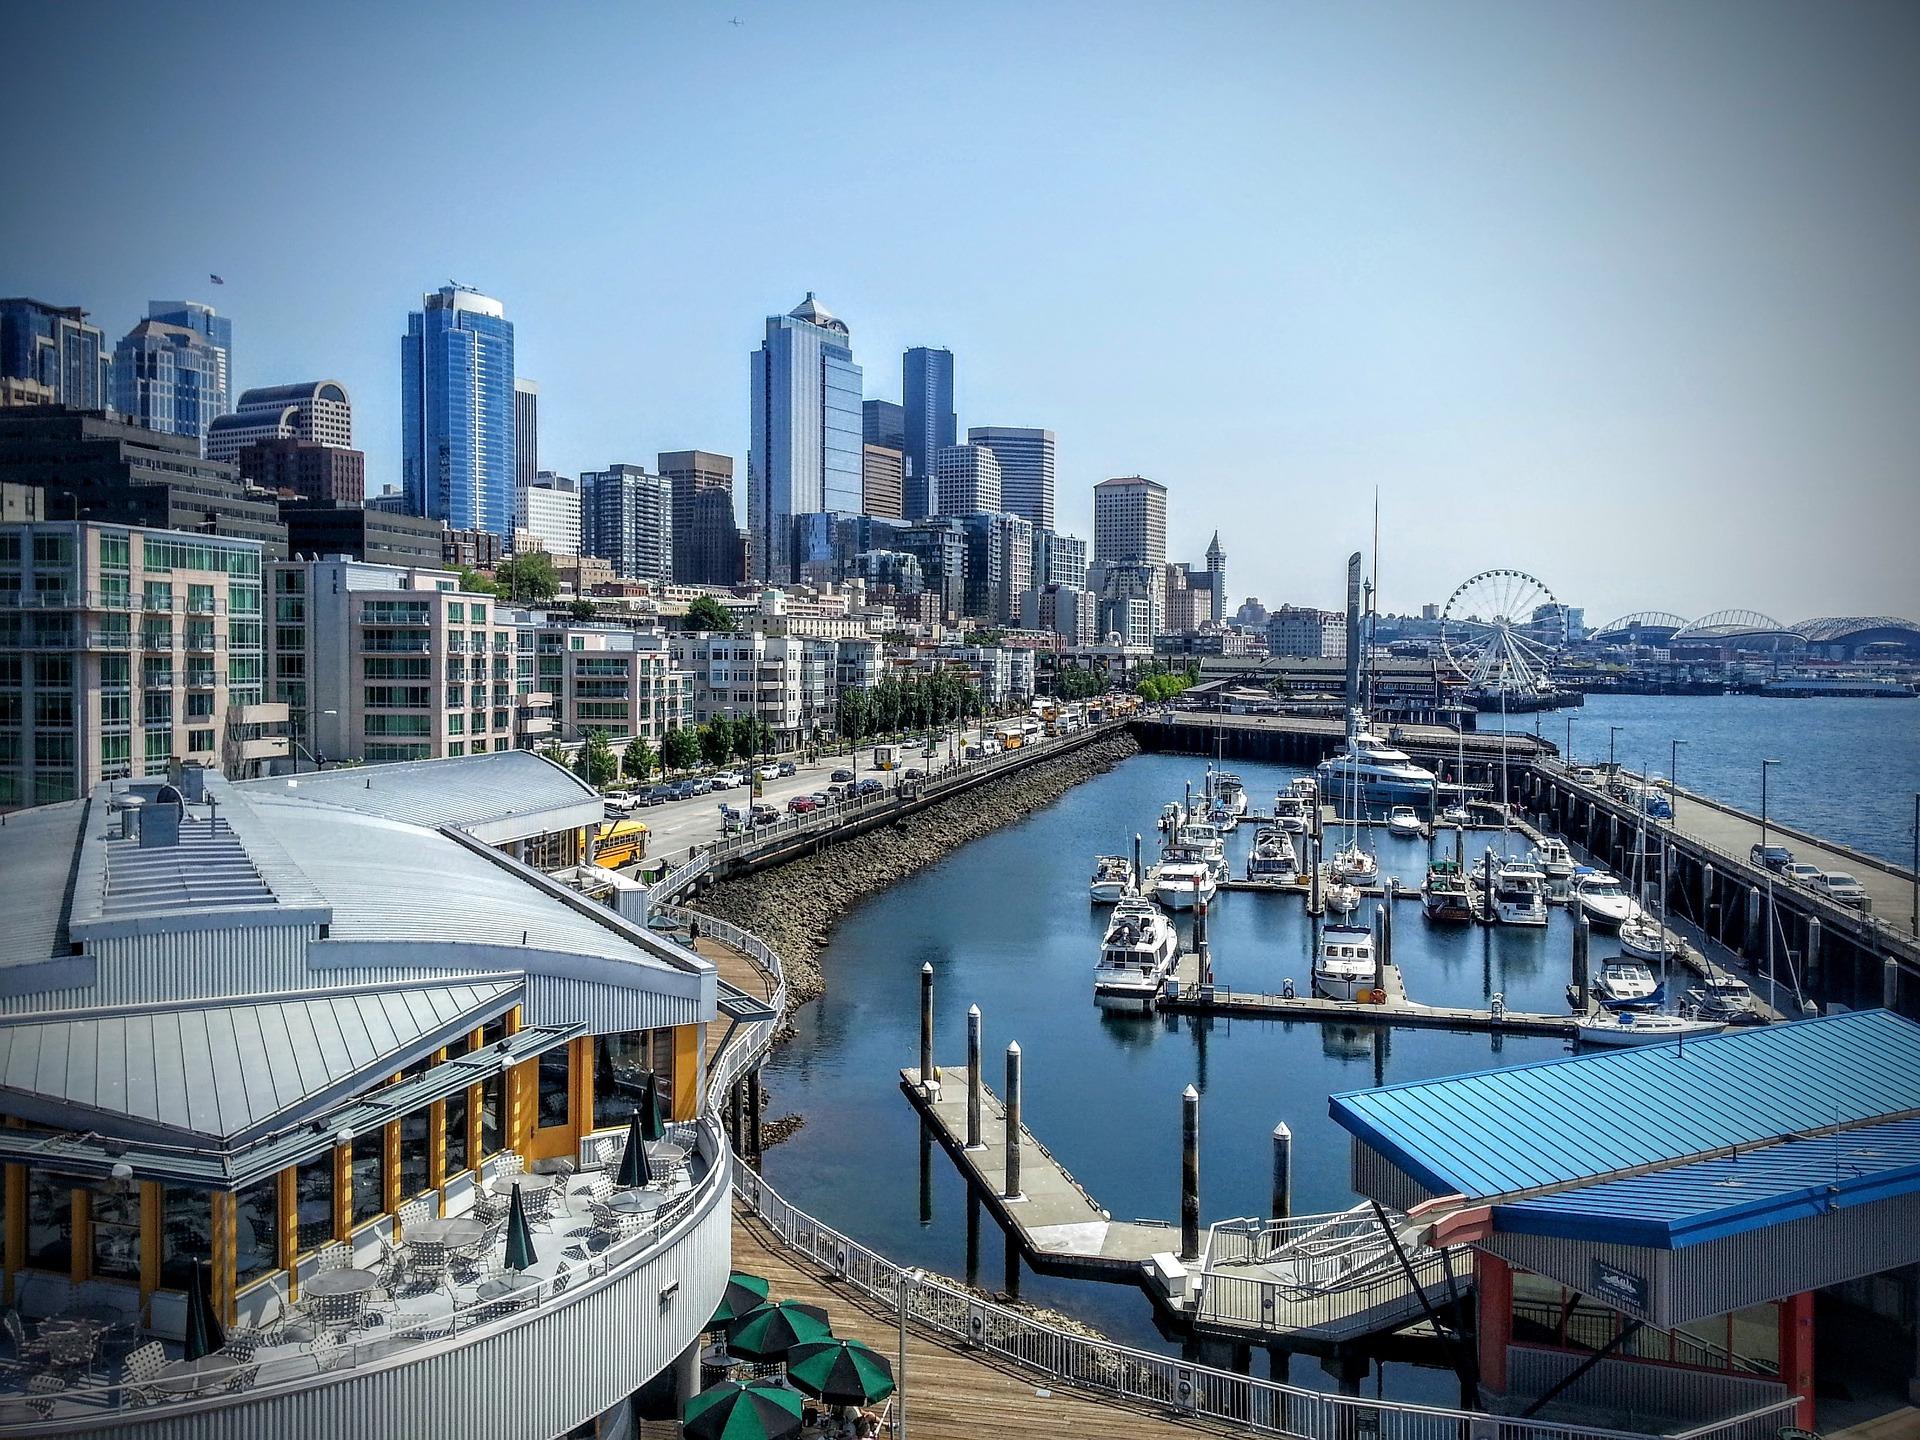 Waterfront in Seattle, Washington USA